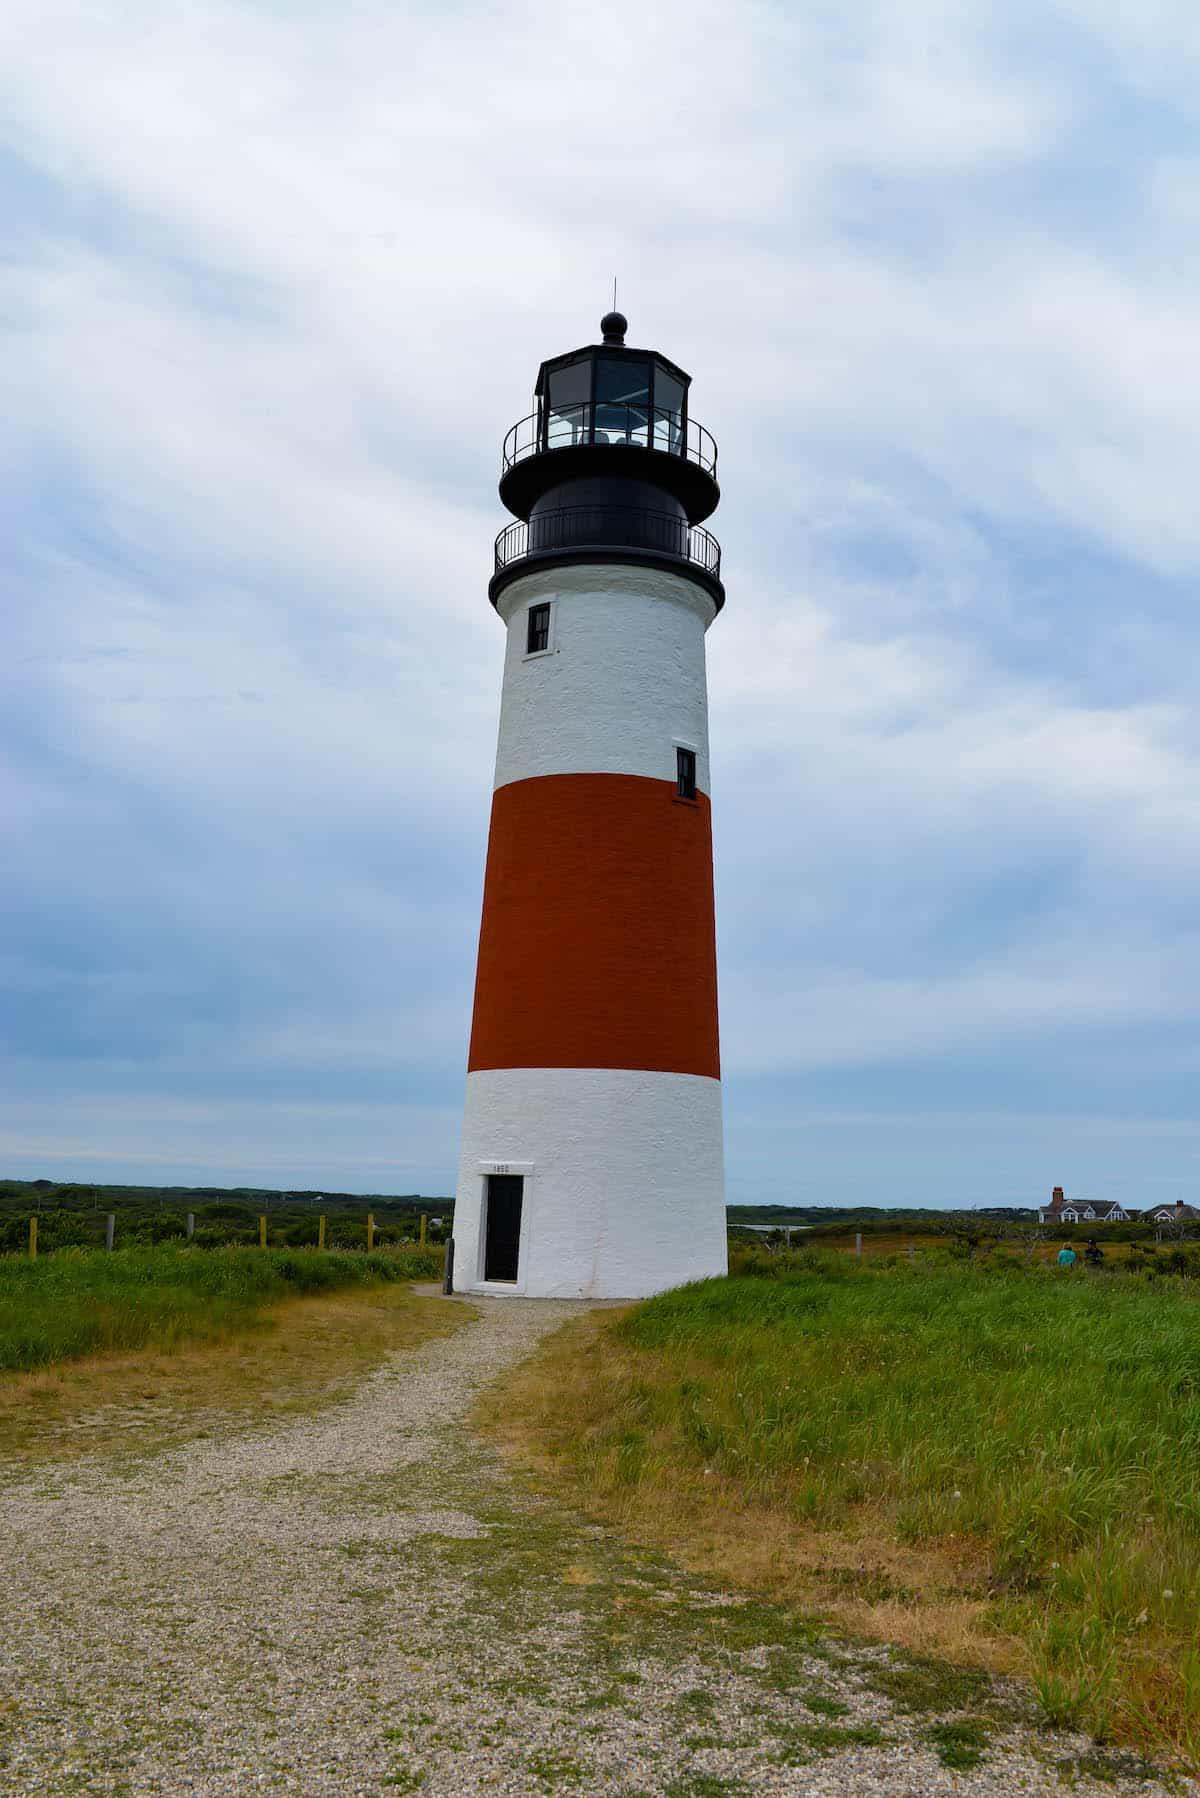 Seems remarkable Sankaty lighthouse nantucket